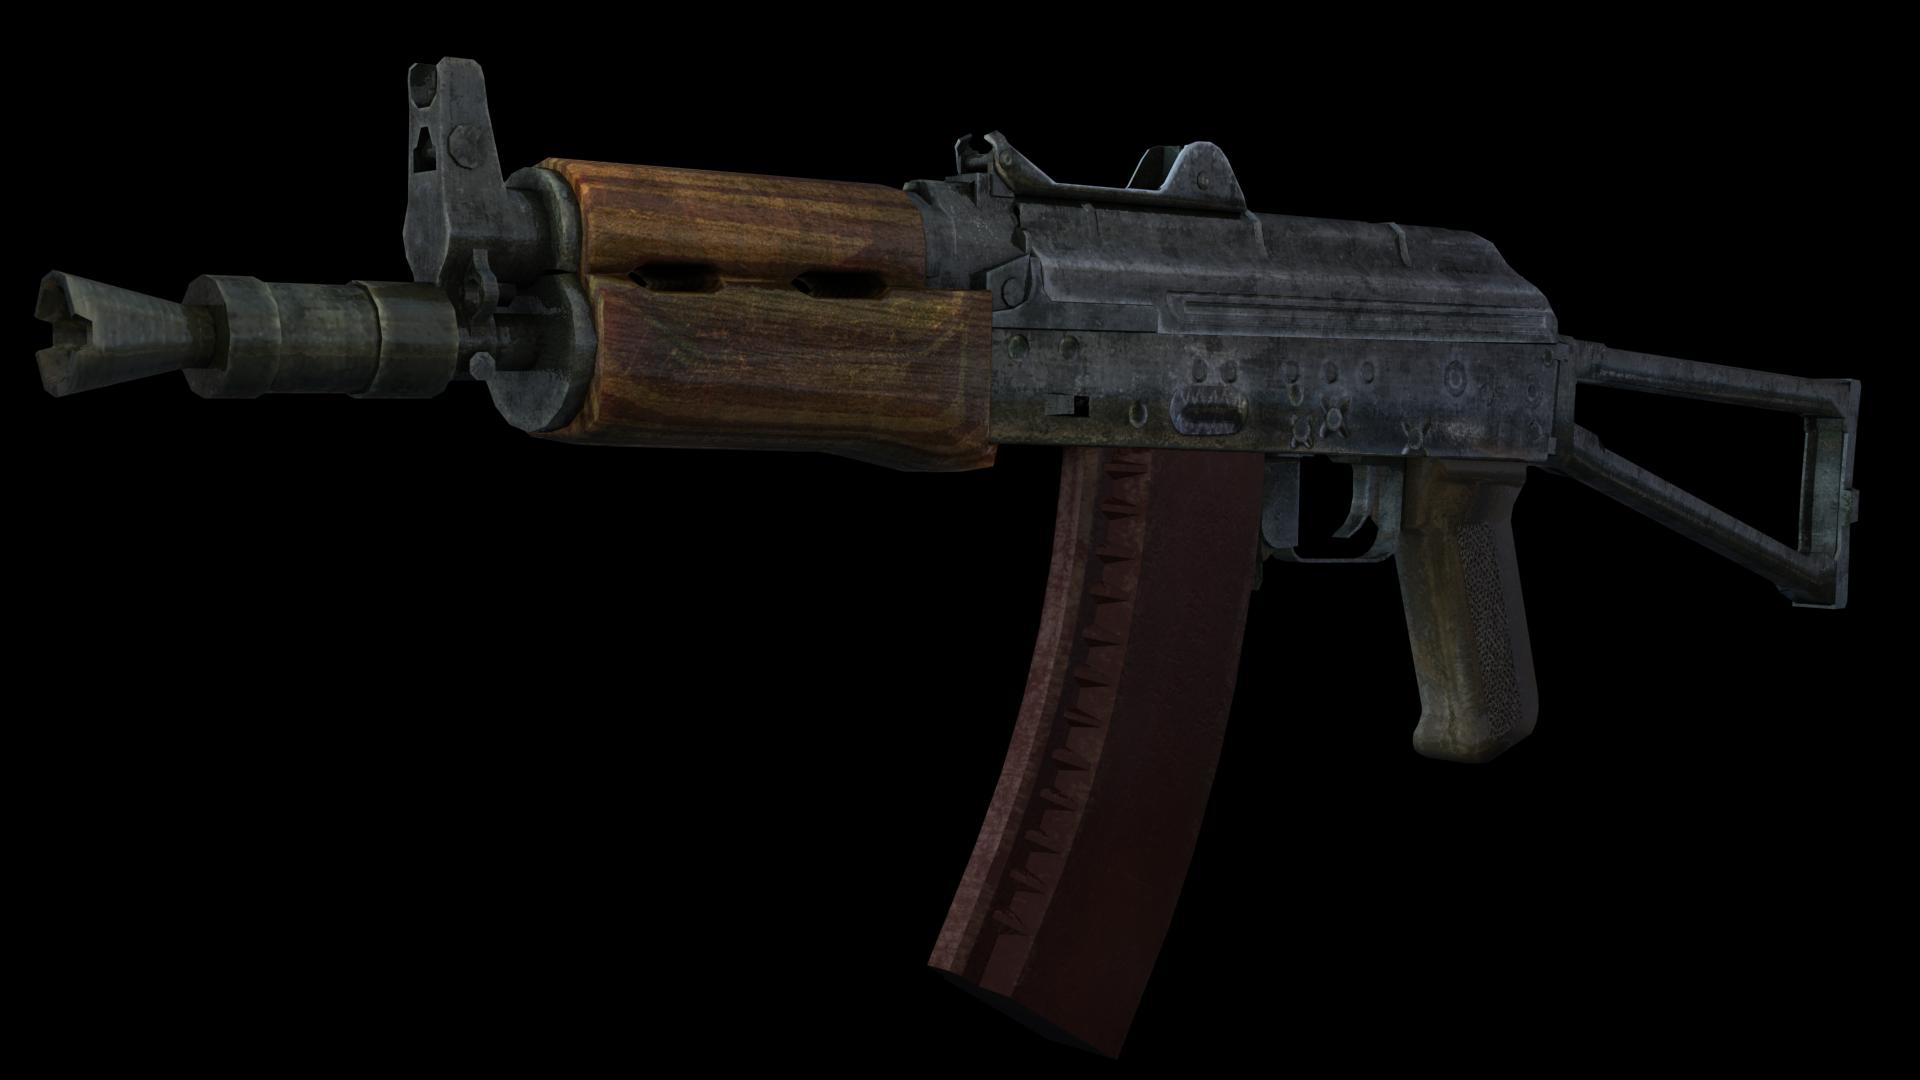 AKS-74U 5 by Garr1971 on DeviantArt